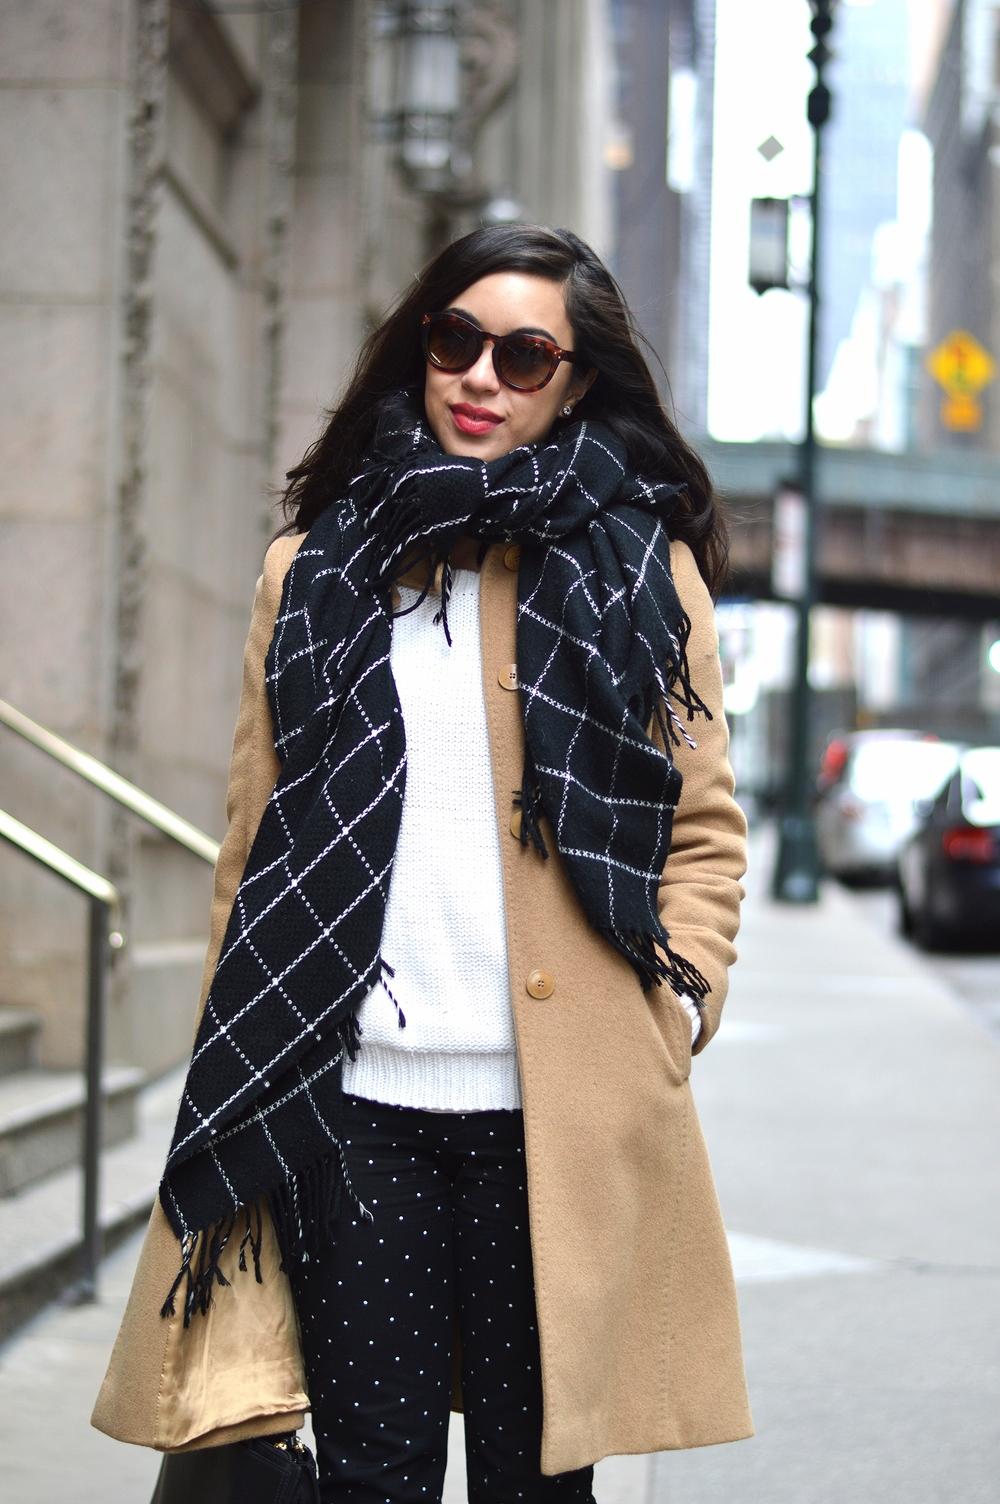 thrifty fashion blogger